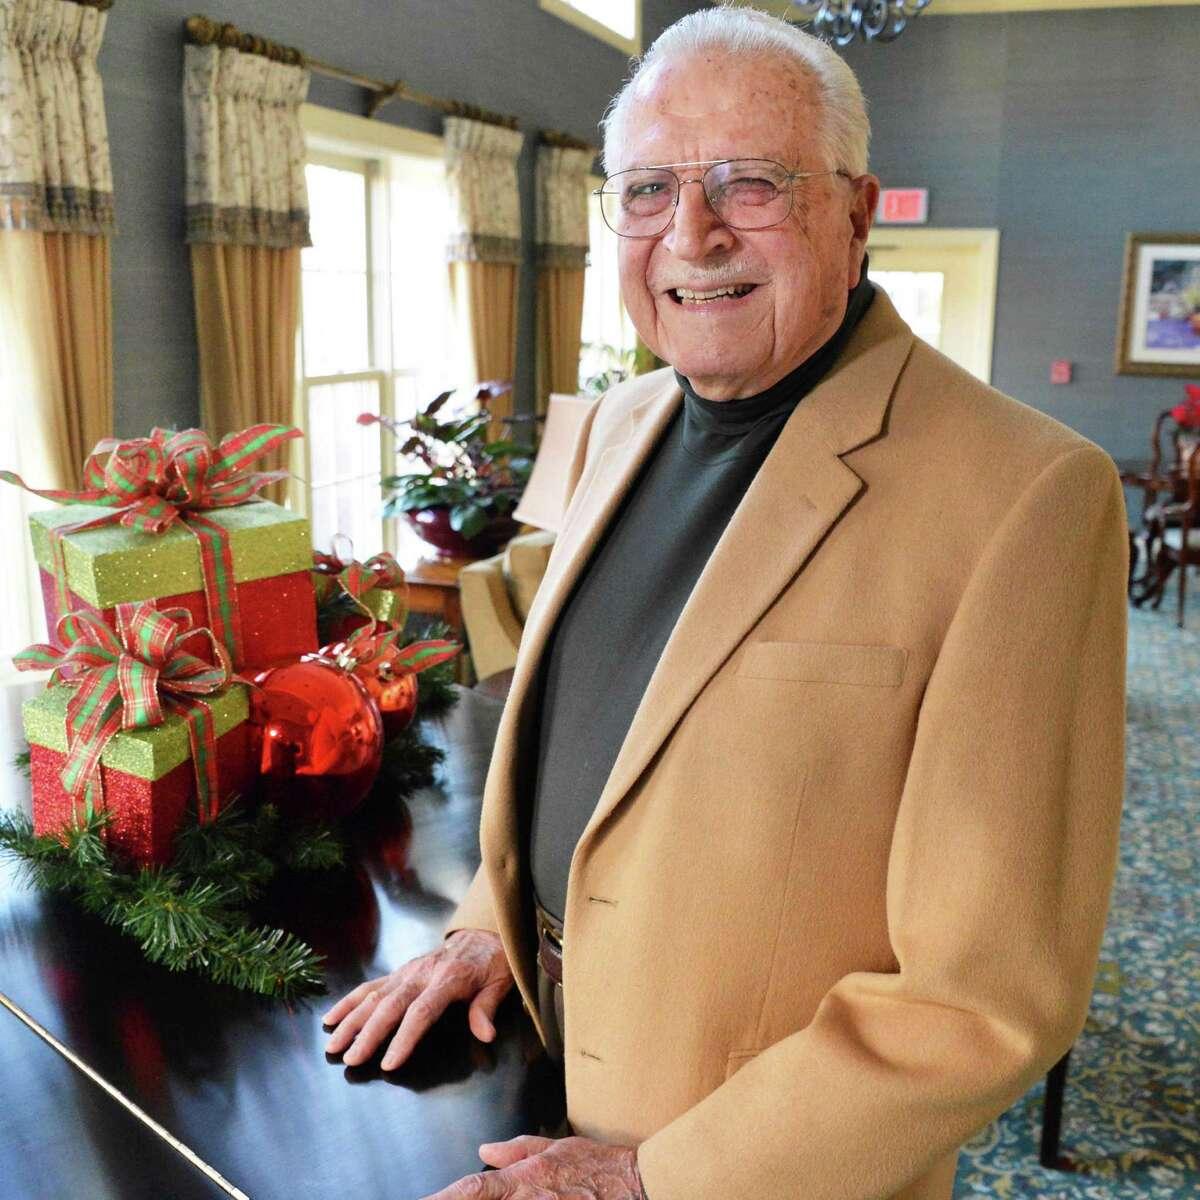 Rev. Robert Lamar at the Beverwyck residential community in Bethlehem Thursday Dec. 6, 2012. (John Carl D'Annibale / Times Union)